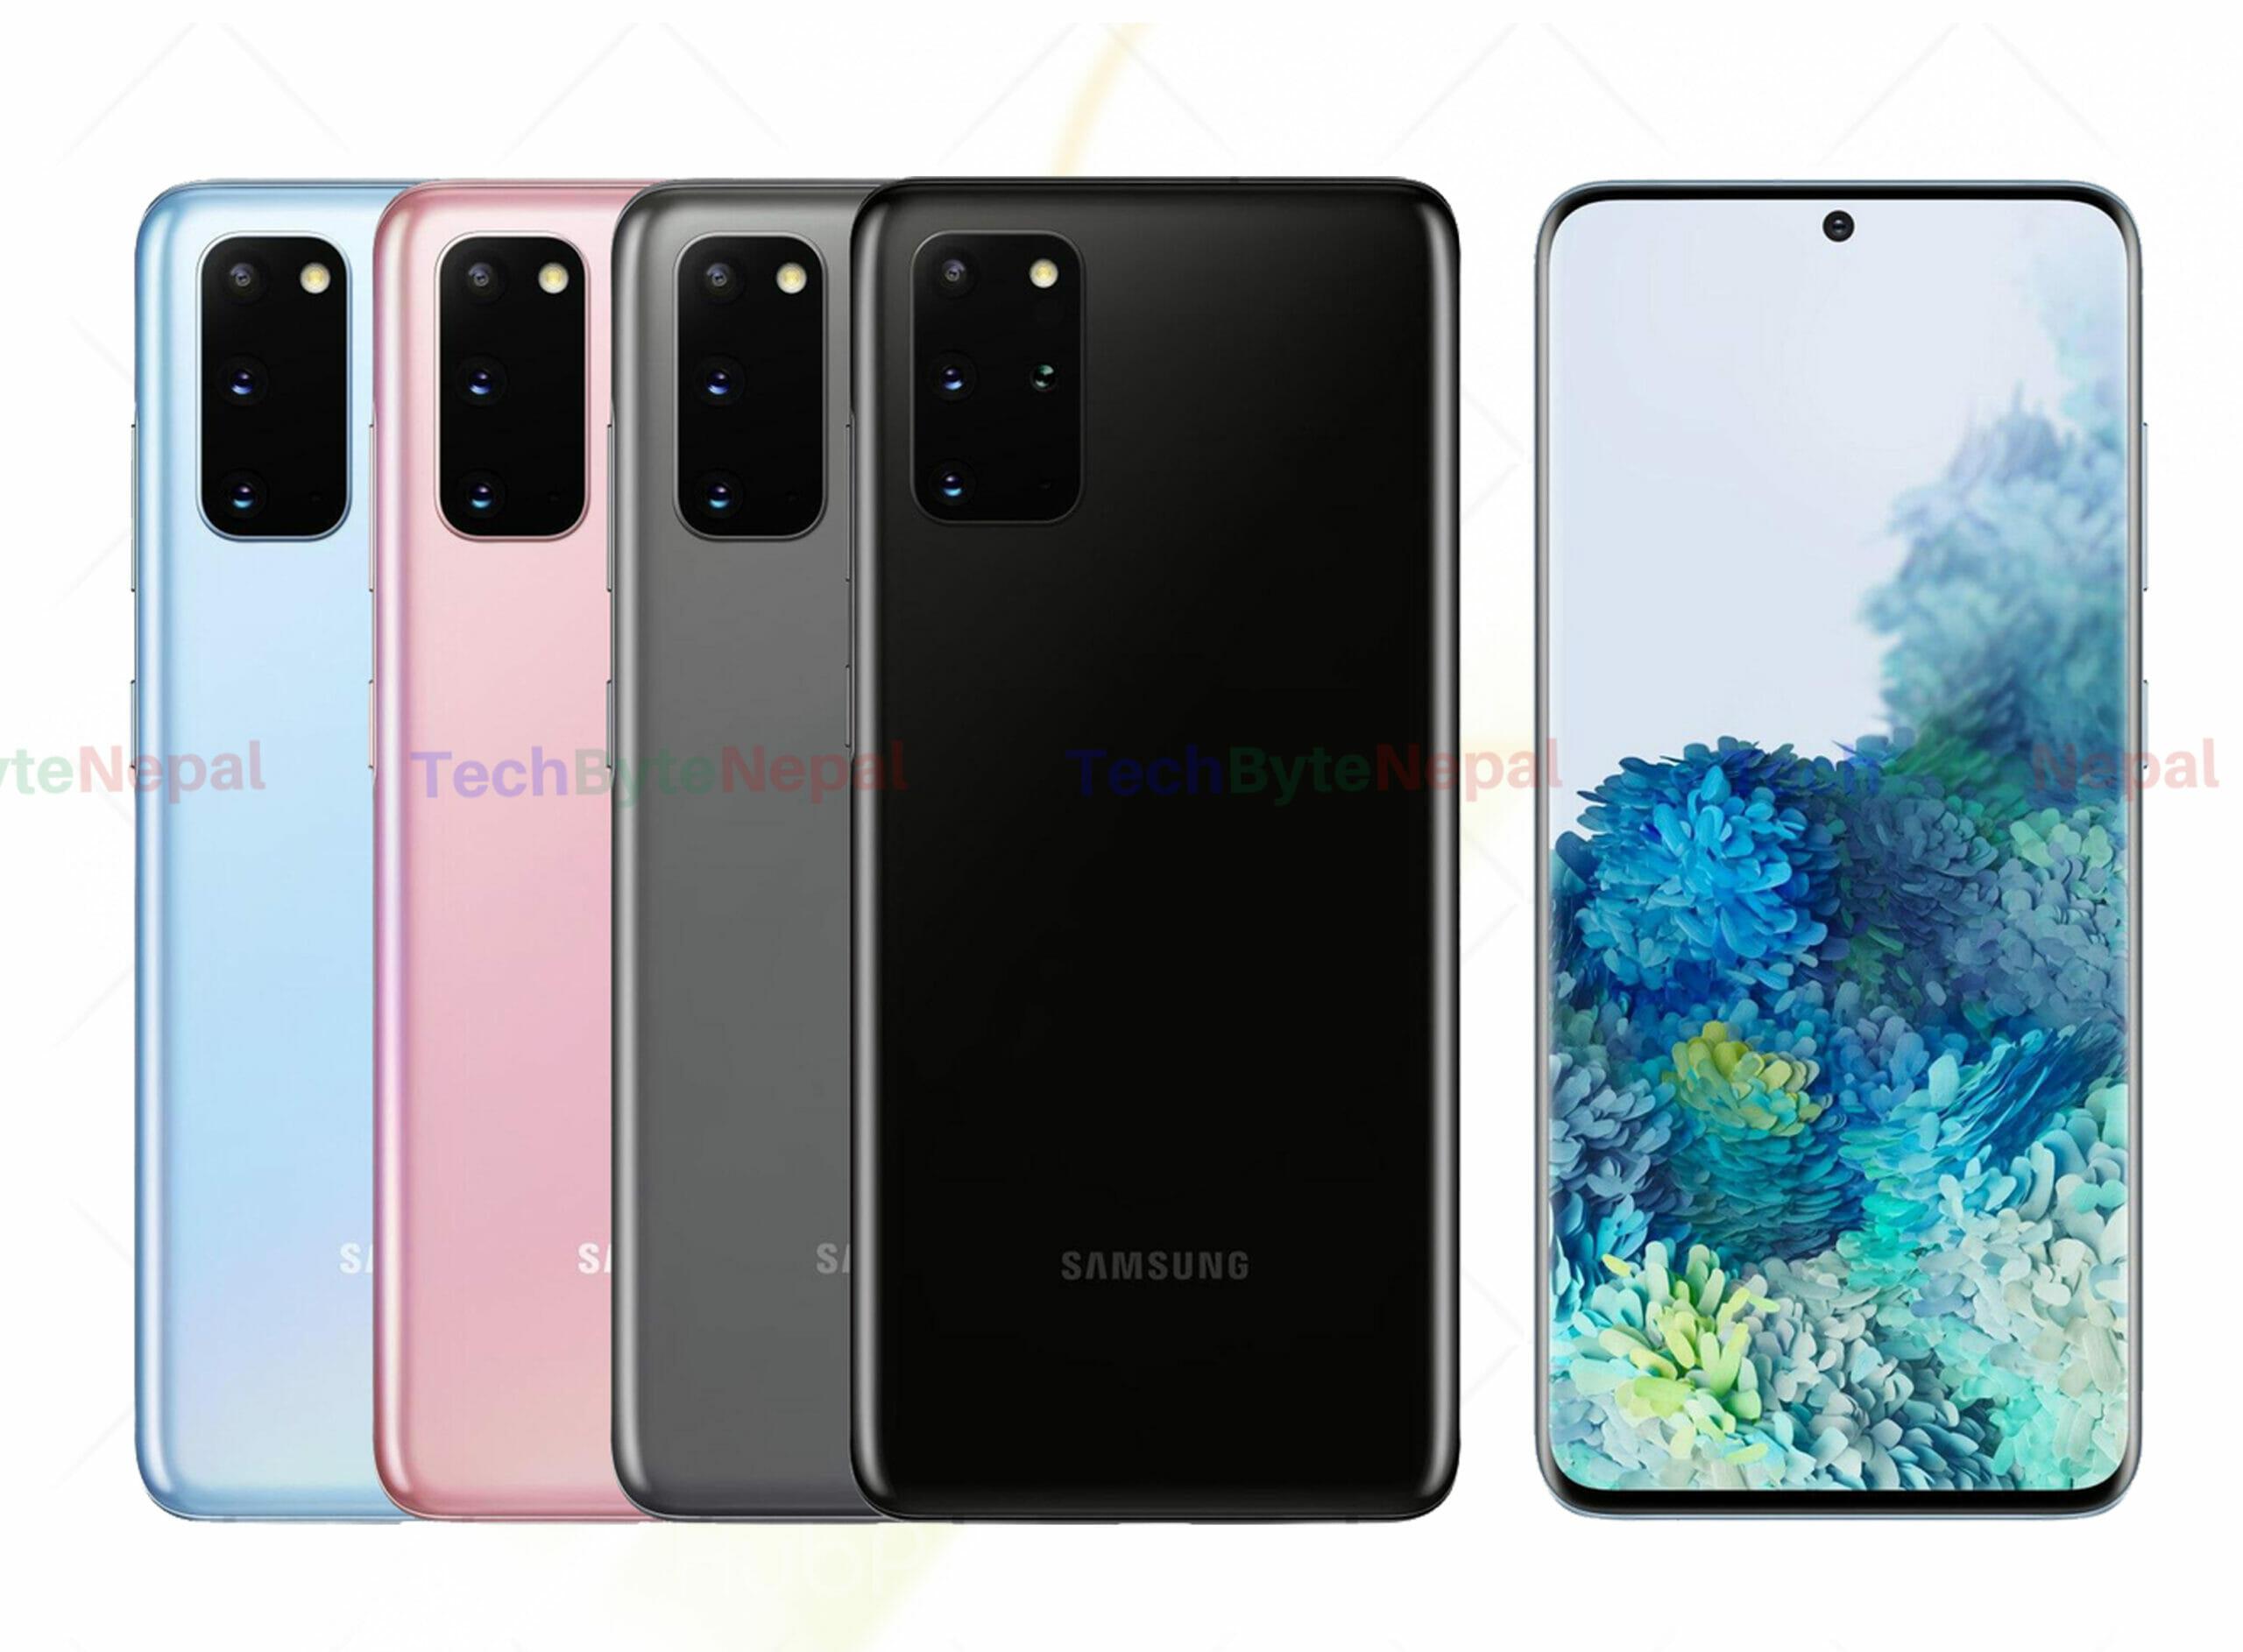 Samsung Galaxy S20 Ultra Colors